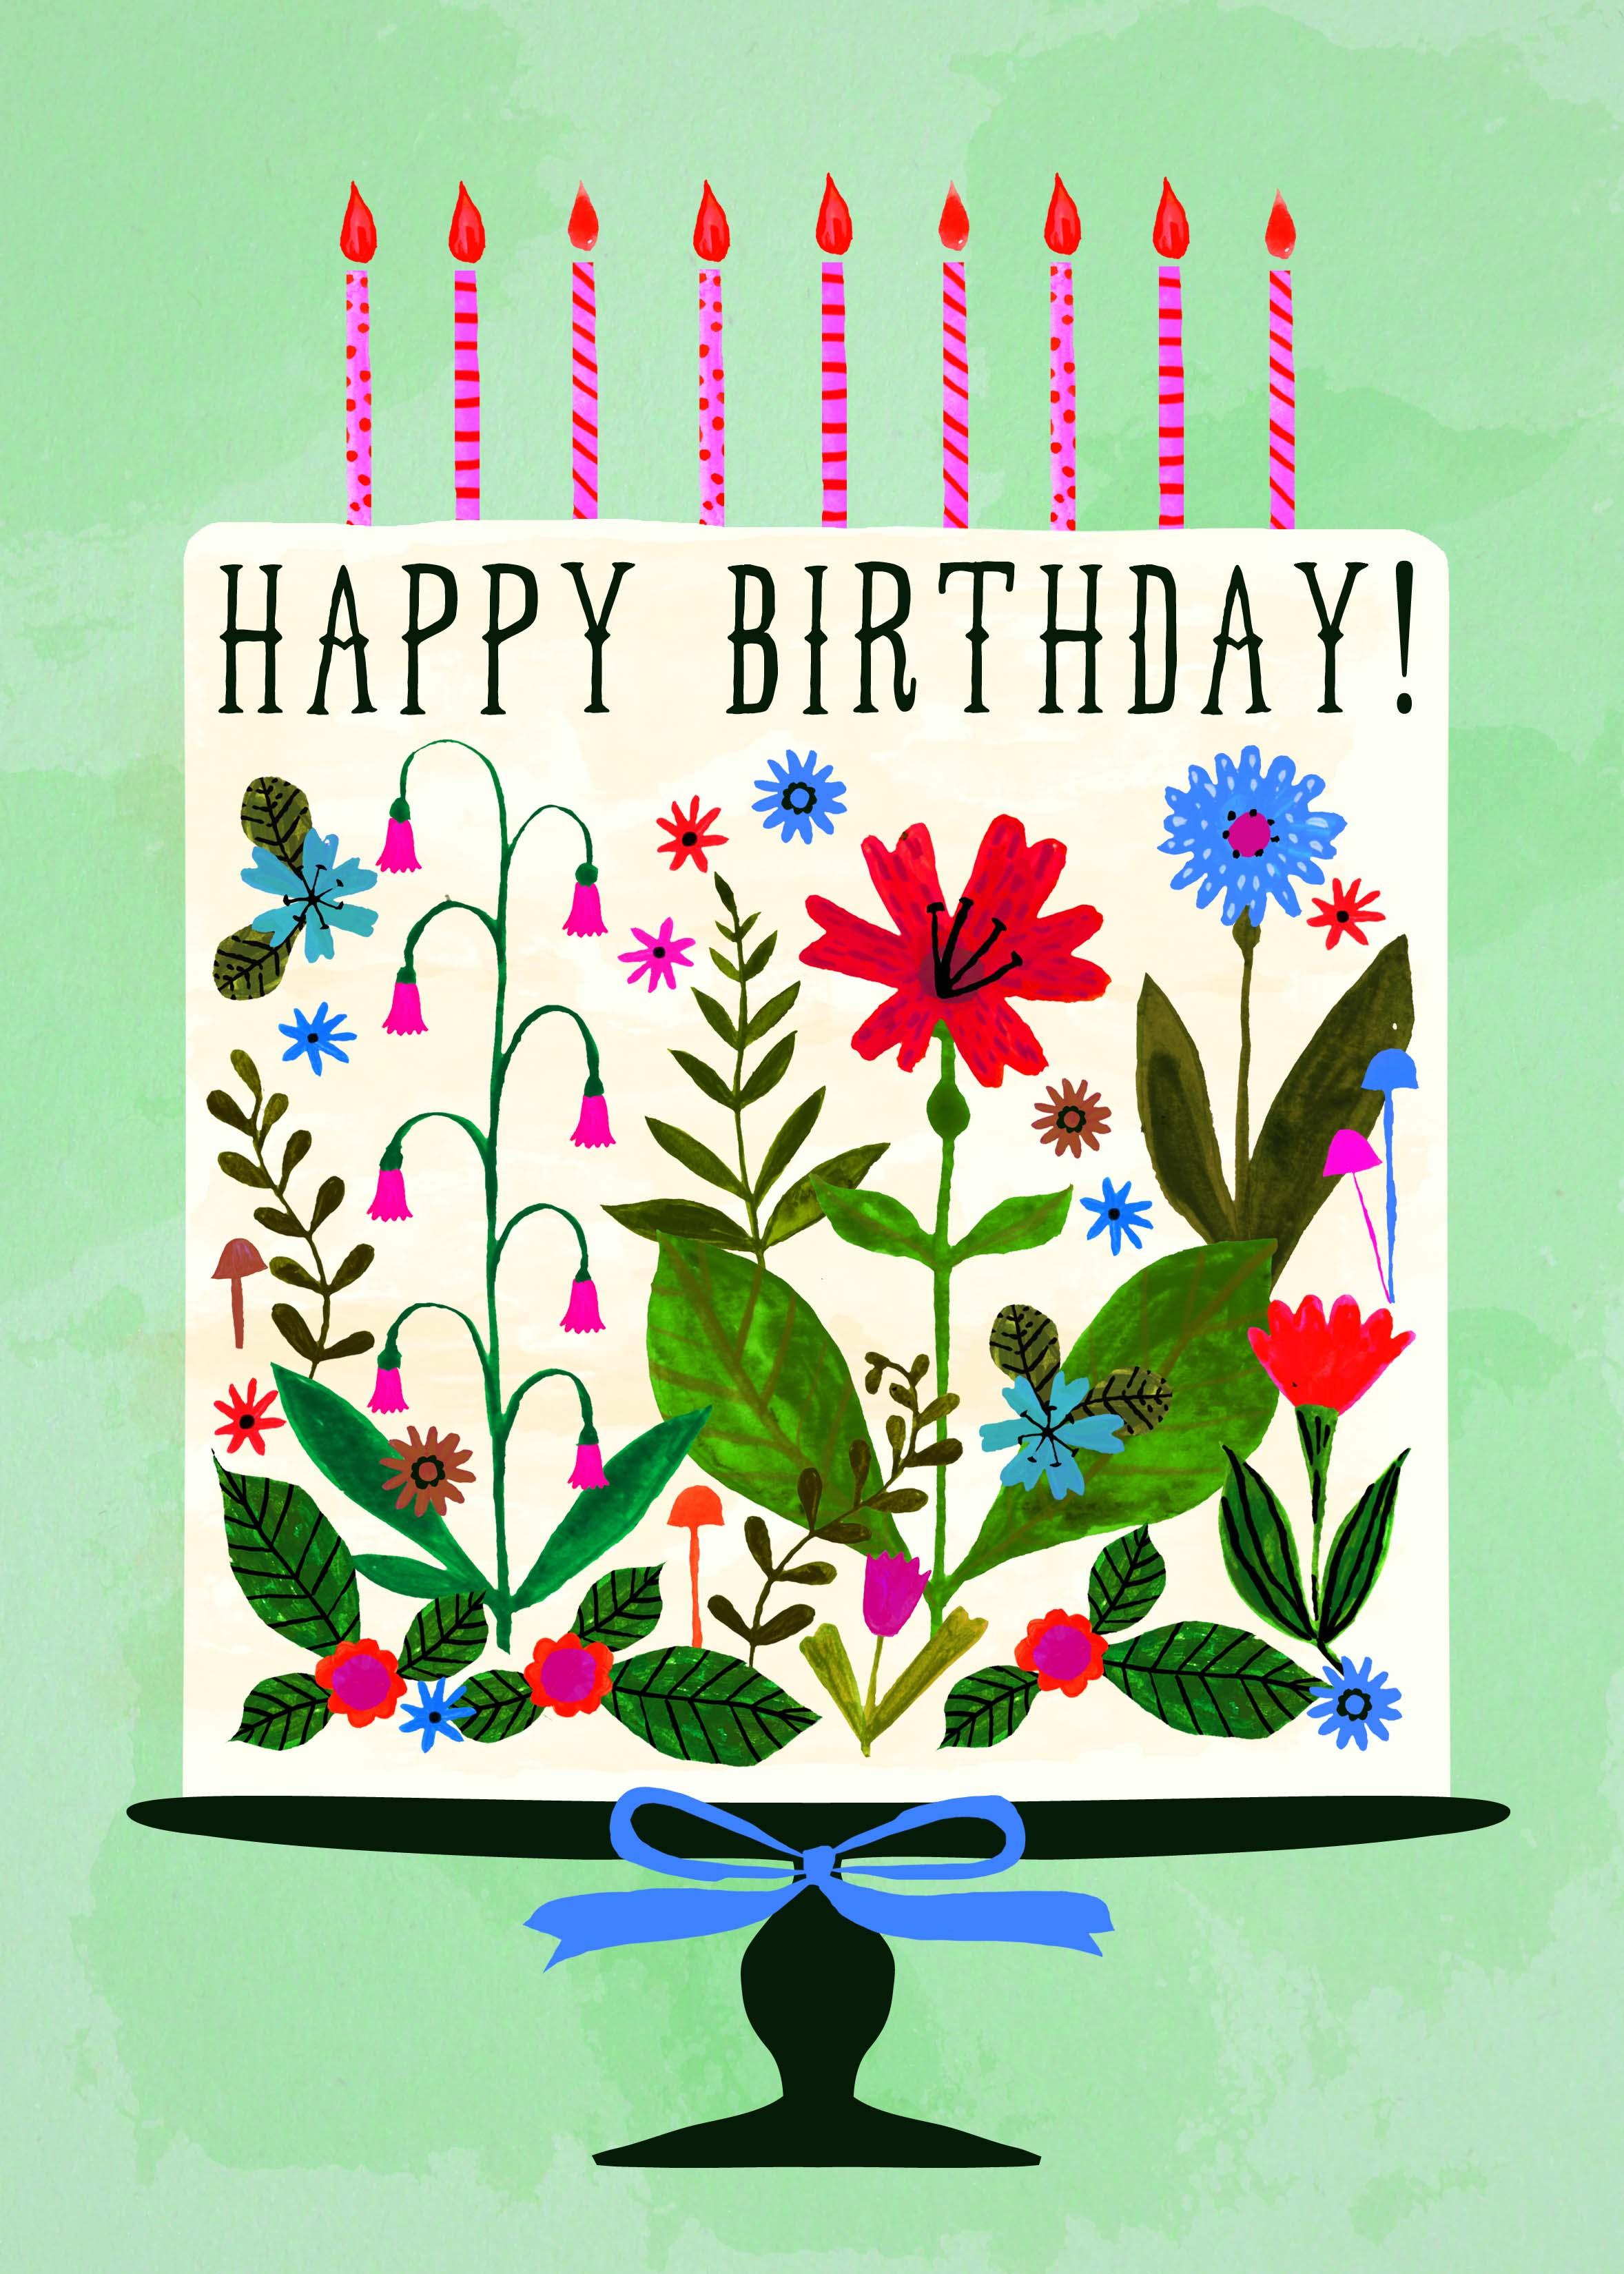 tara_PP_painted_birthday_cake.jpg